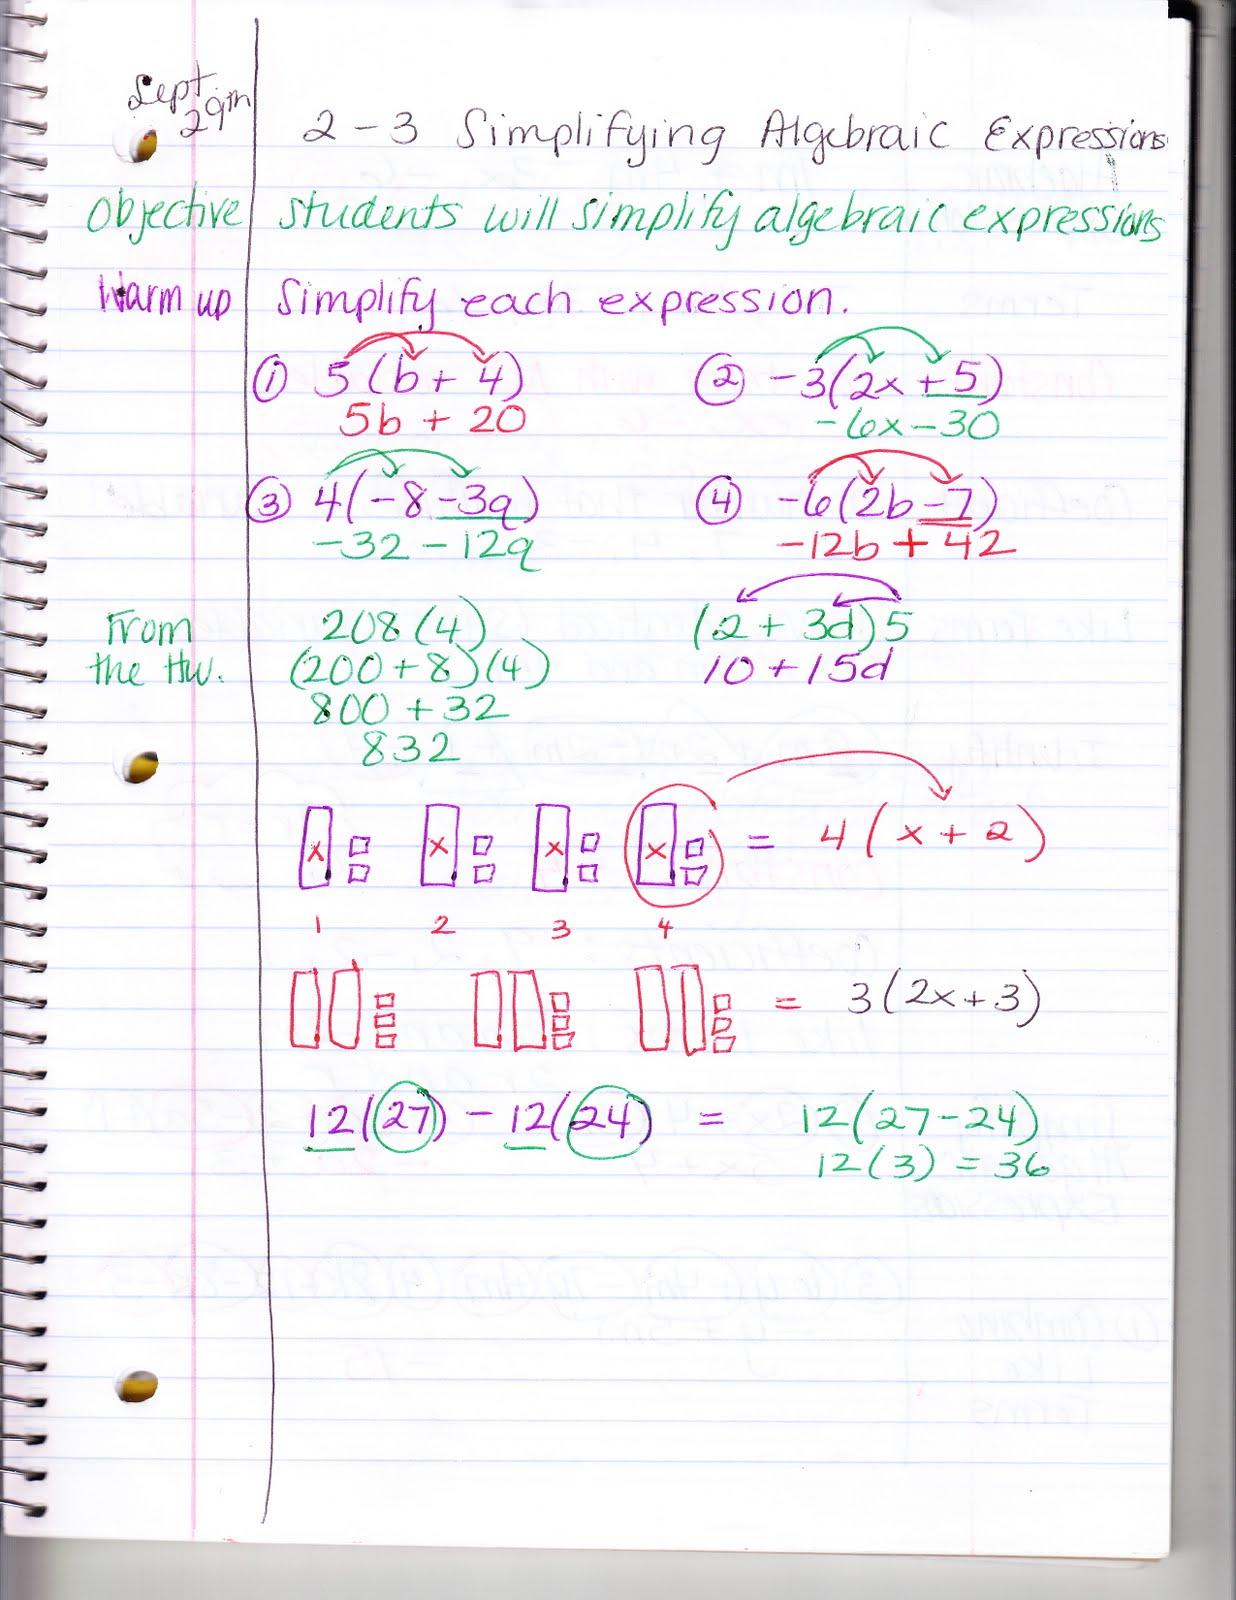 Ms Jean S Classroom Blog 2 3 Simplifying Algebraic